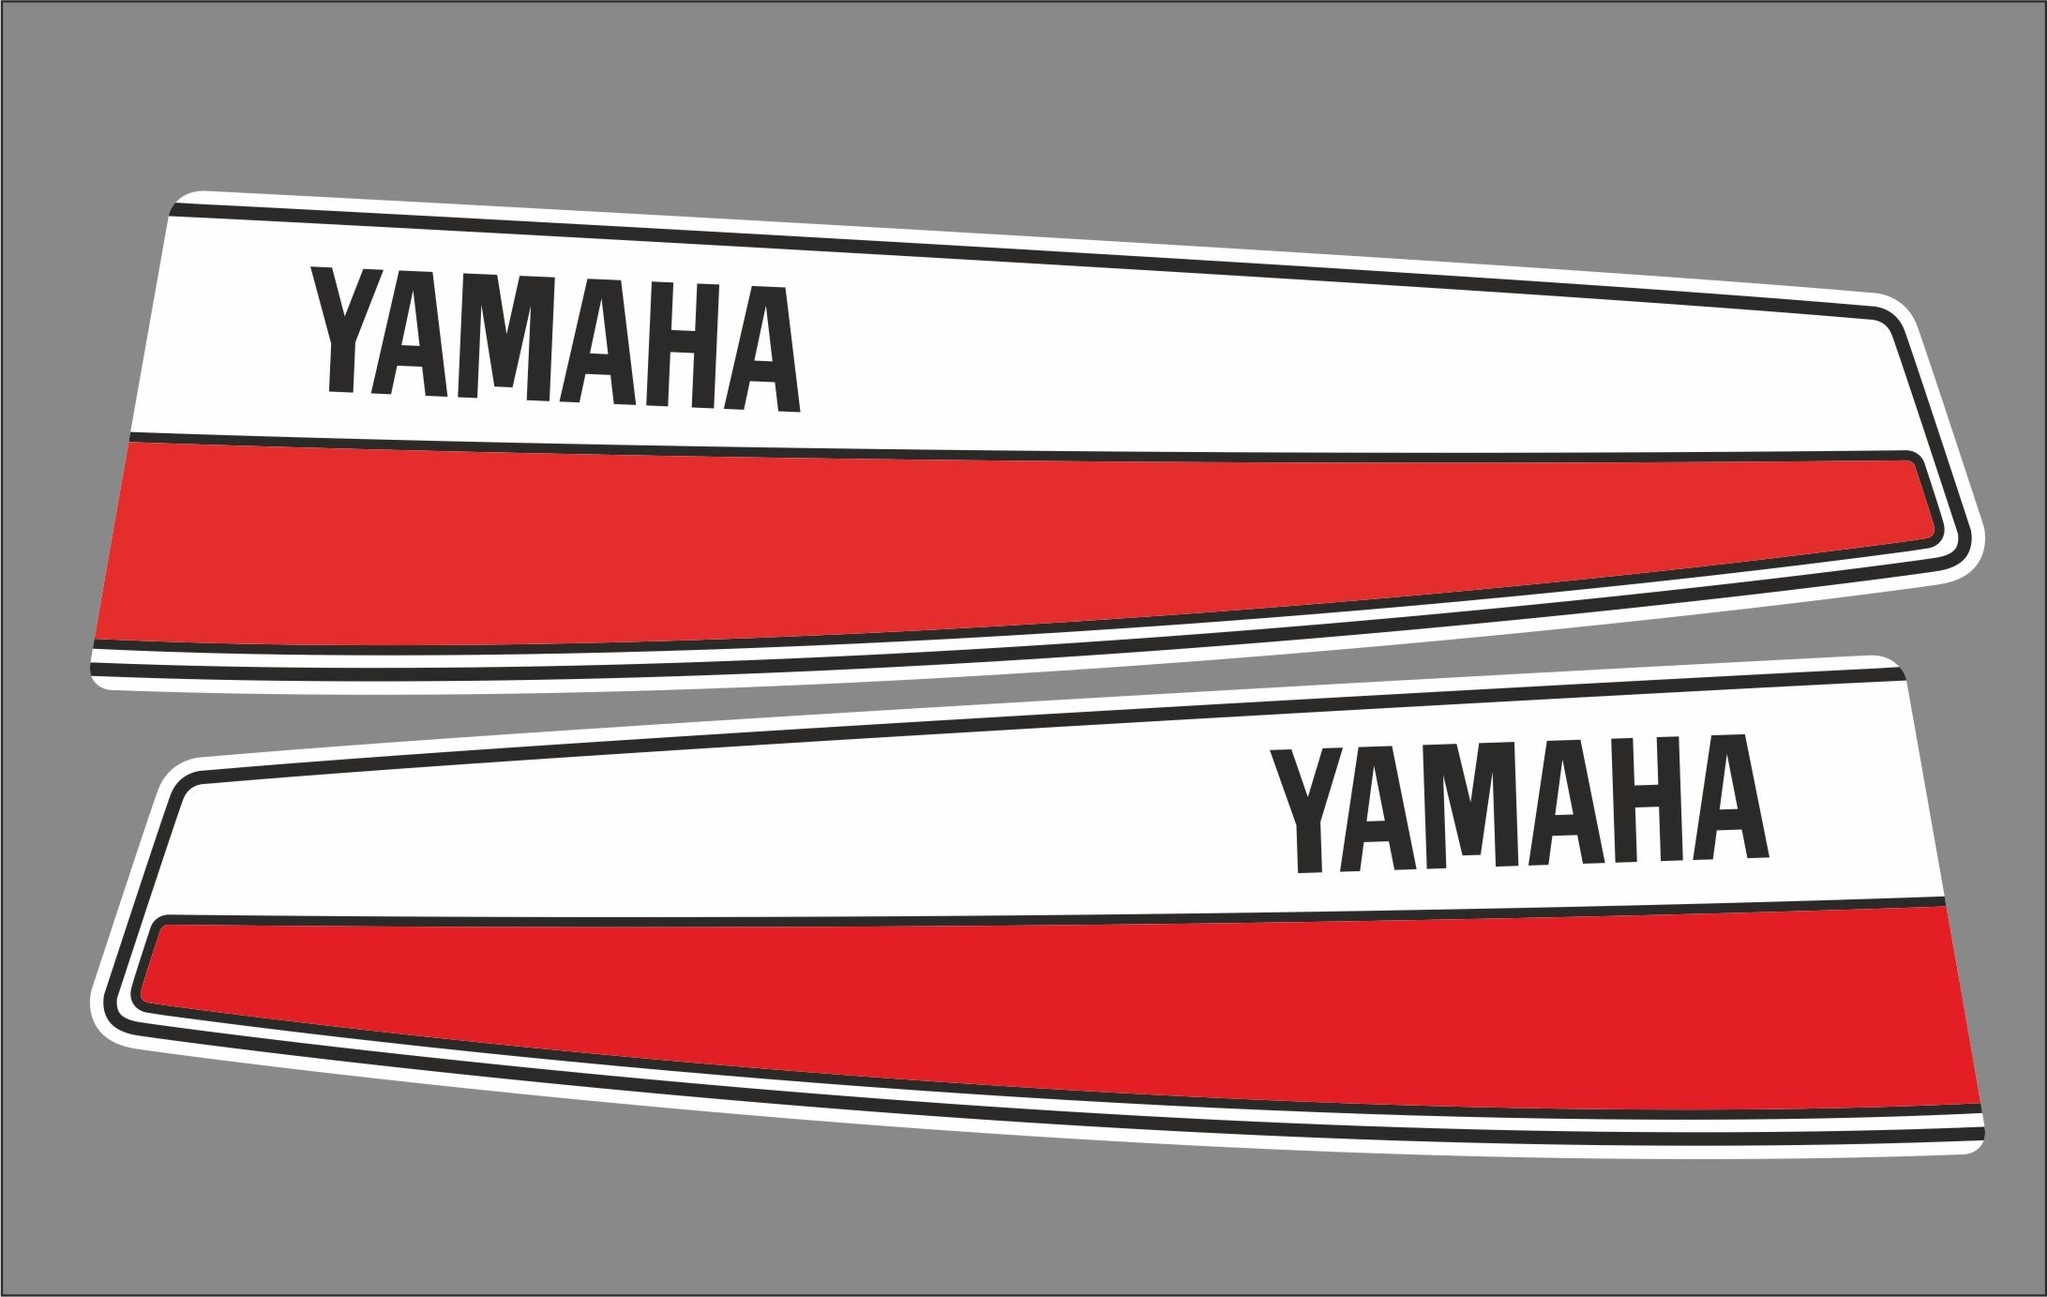 Yamaha 28 bouwjaar 1983- 1988 Sticker set